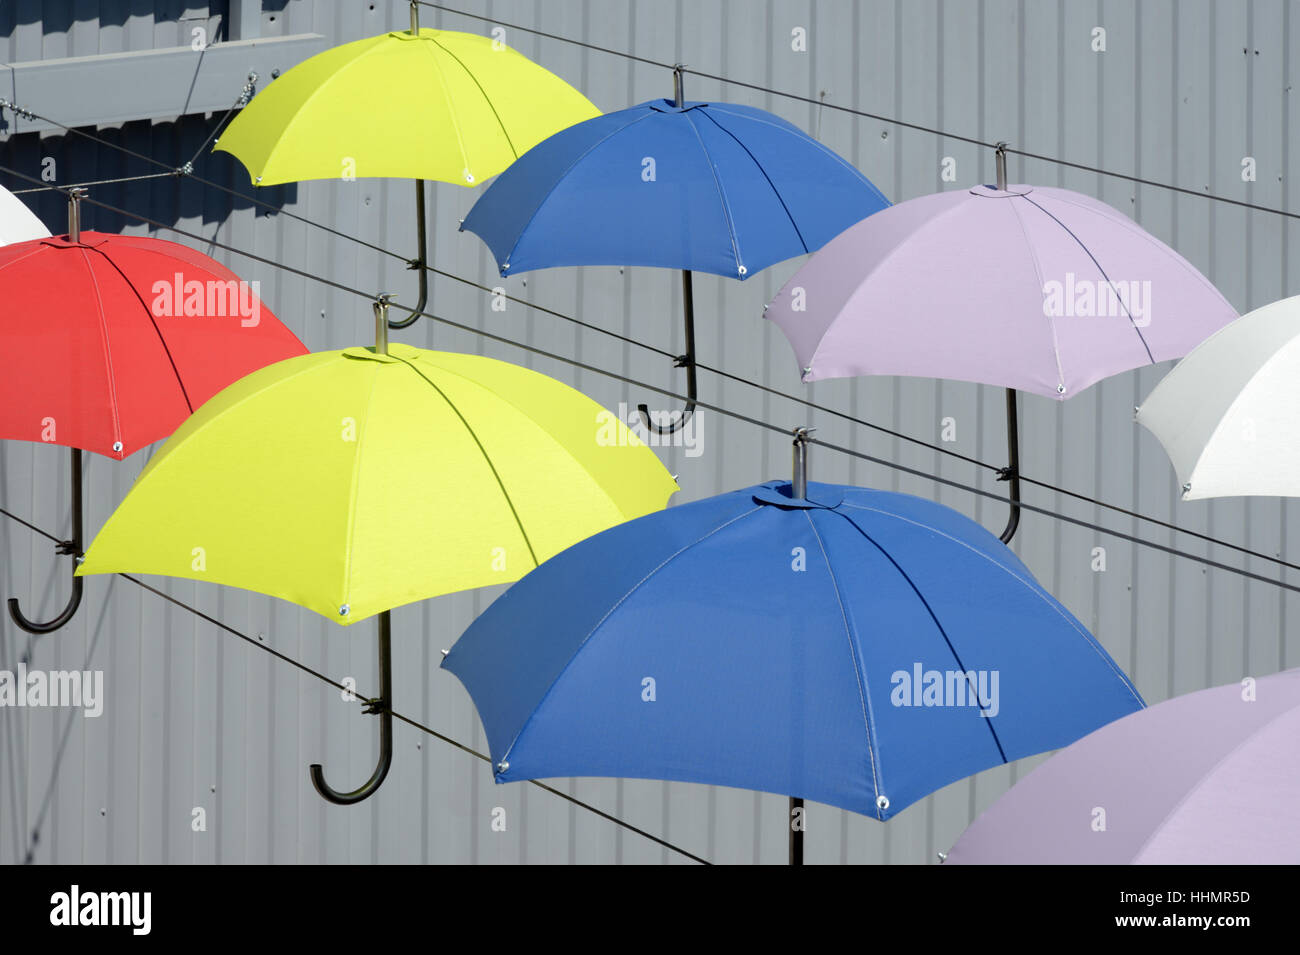 Multi-Colored Umbrellas or Umbrella Art Installation Aix-en-Provence Provence France - Stock Image